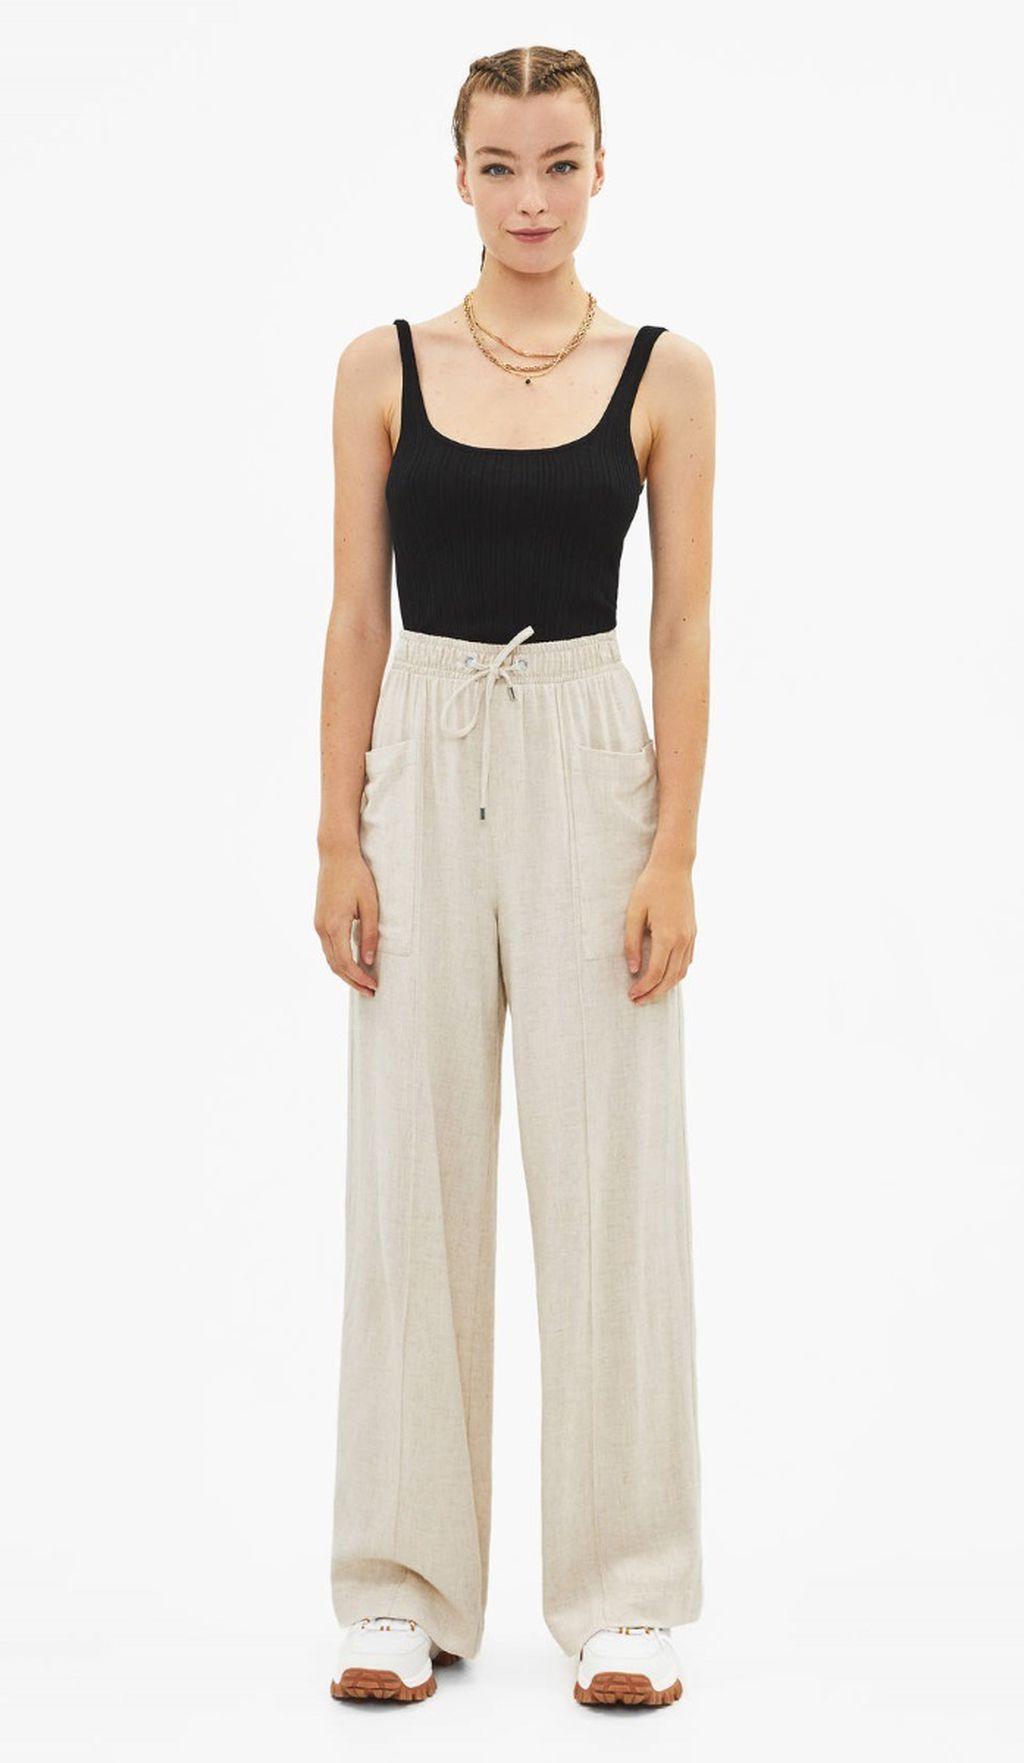 Lagane hlače stvorene za sparine - 12